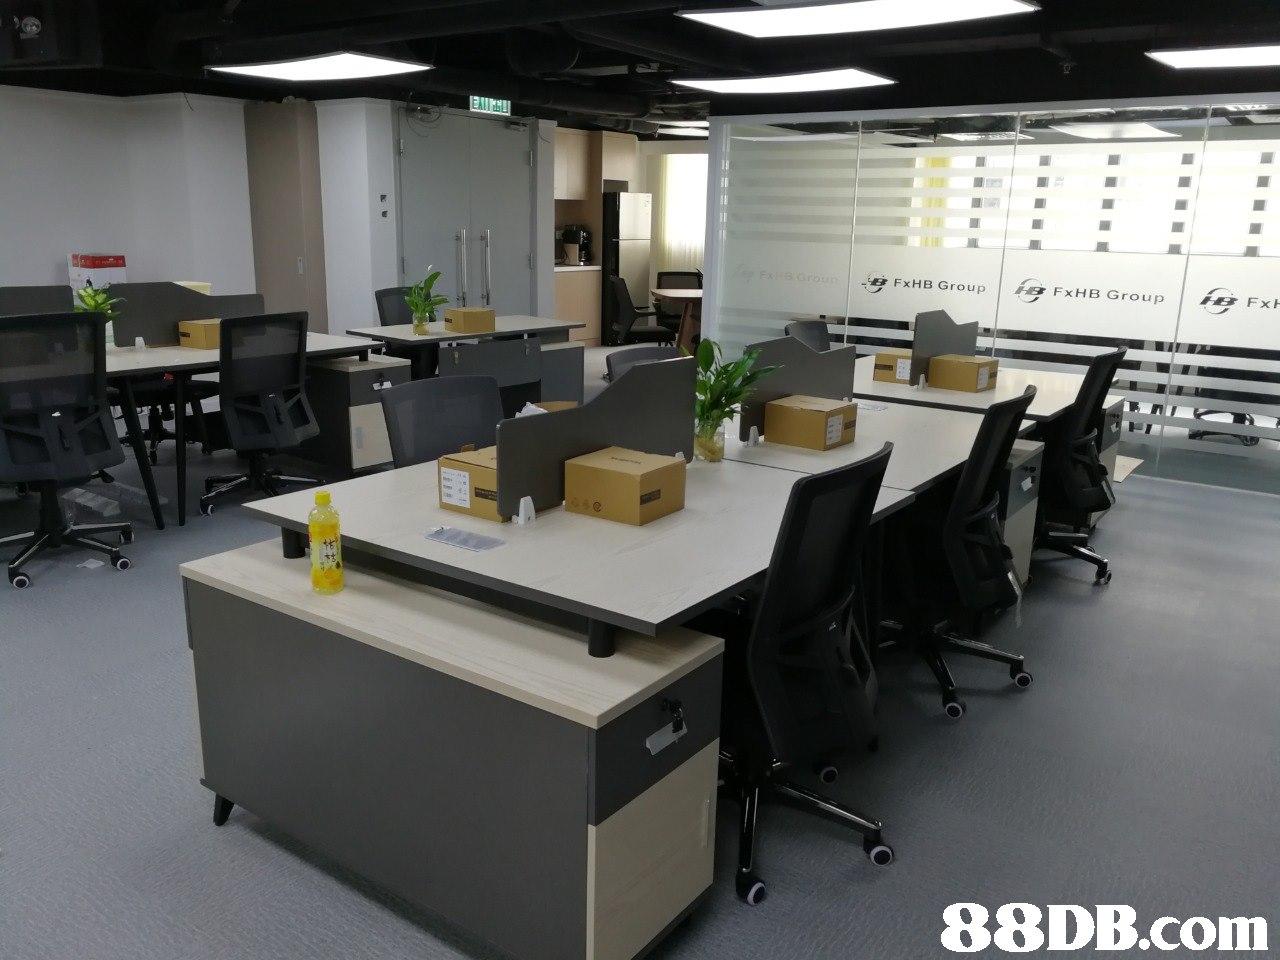 FxHB GroupFxHB Group   office,furniture,